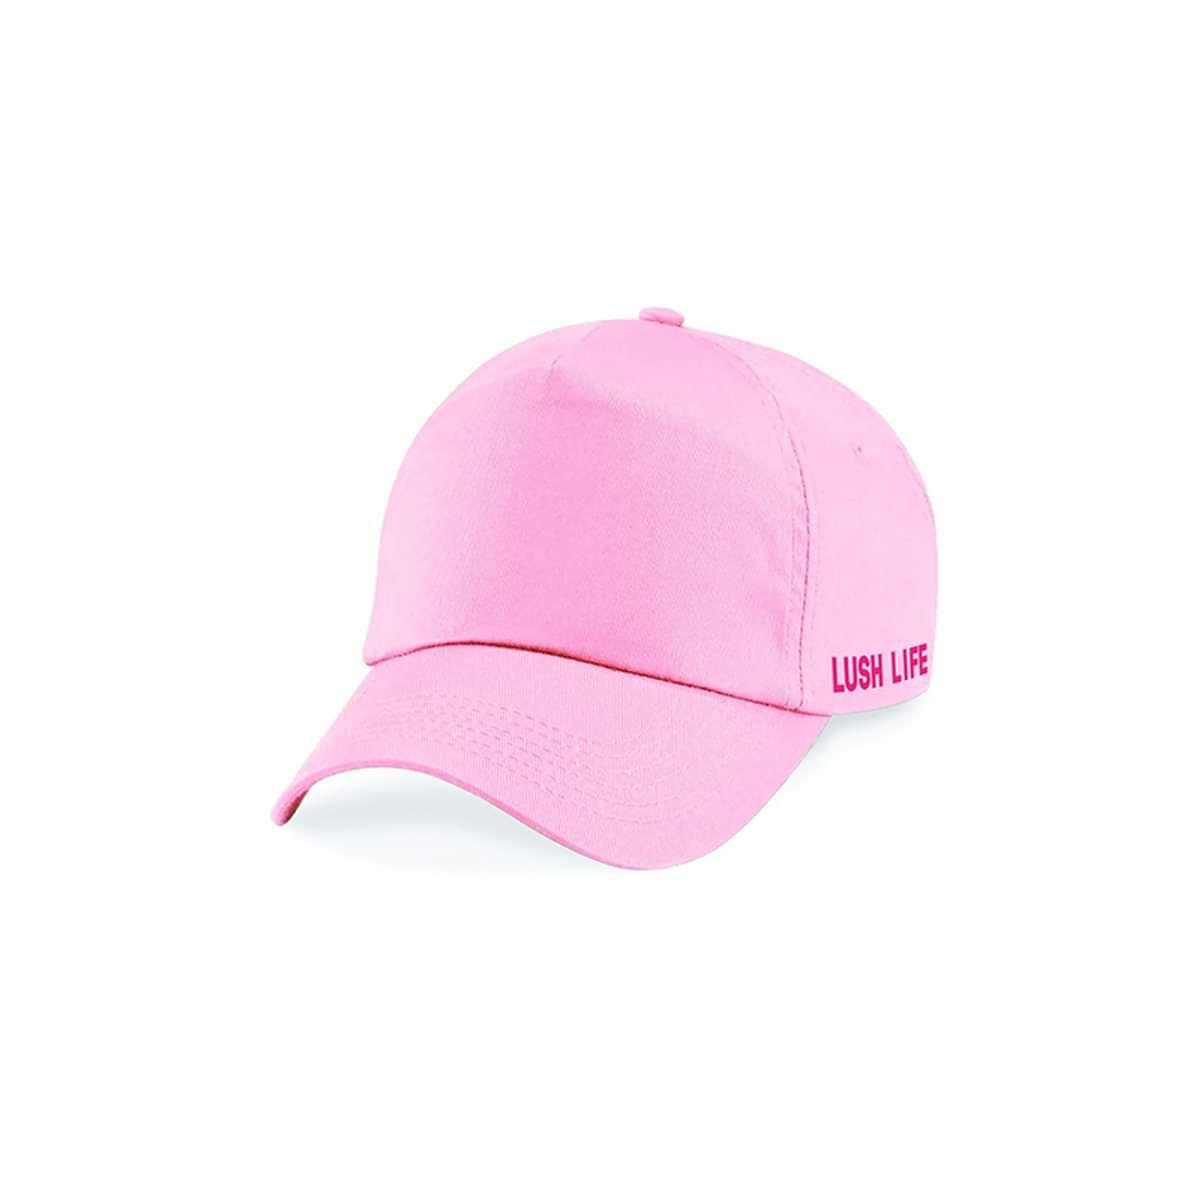 2d077ee9a17 Lush Life – Pink Baseball Cap - Zara Larsson